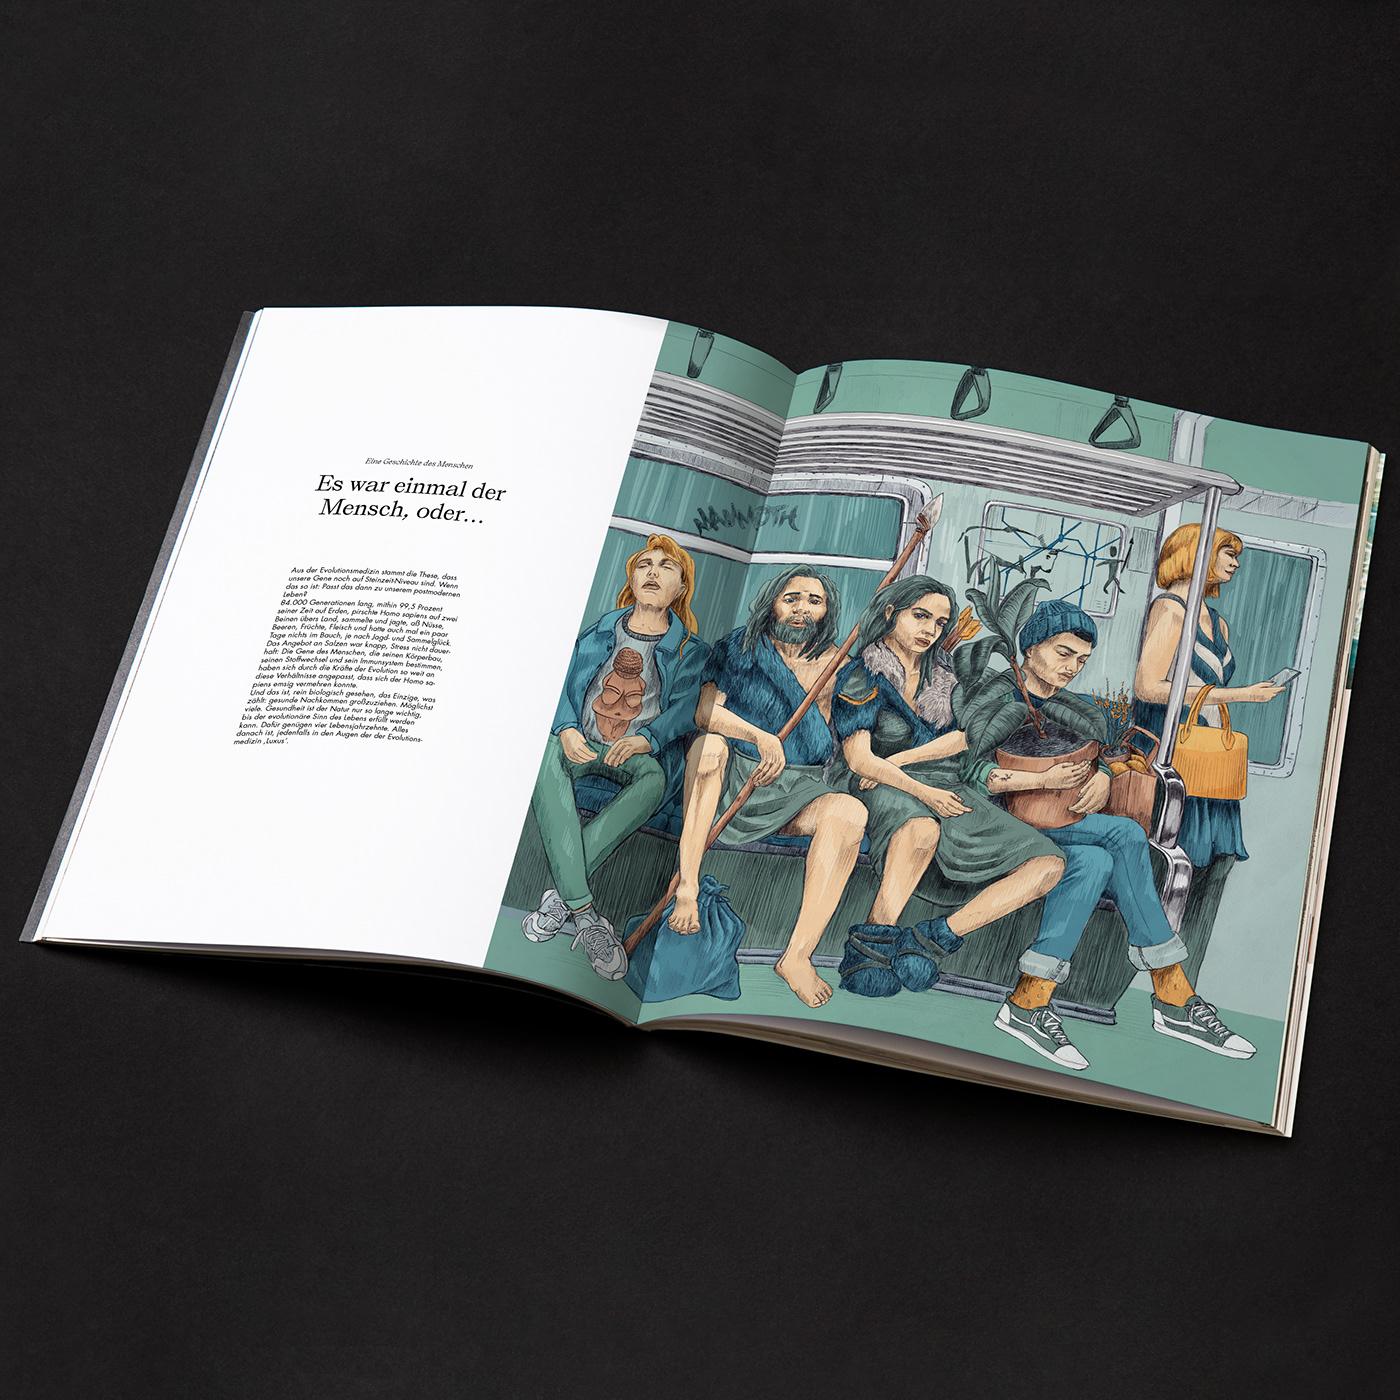 Image may contain: book and cartoon